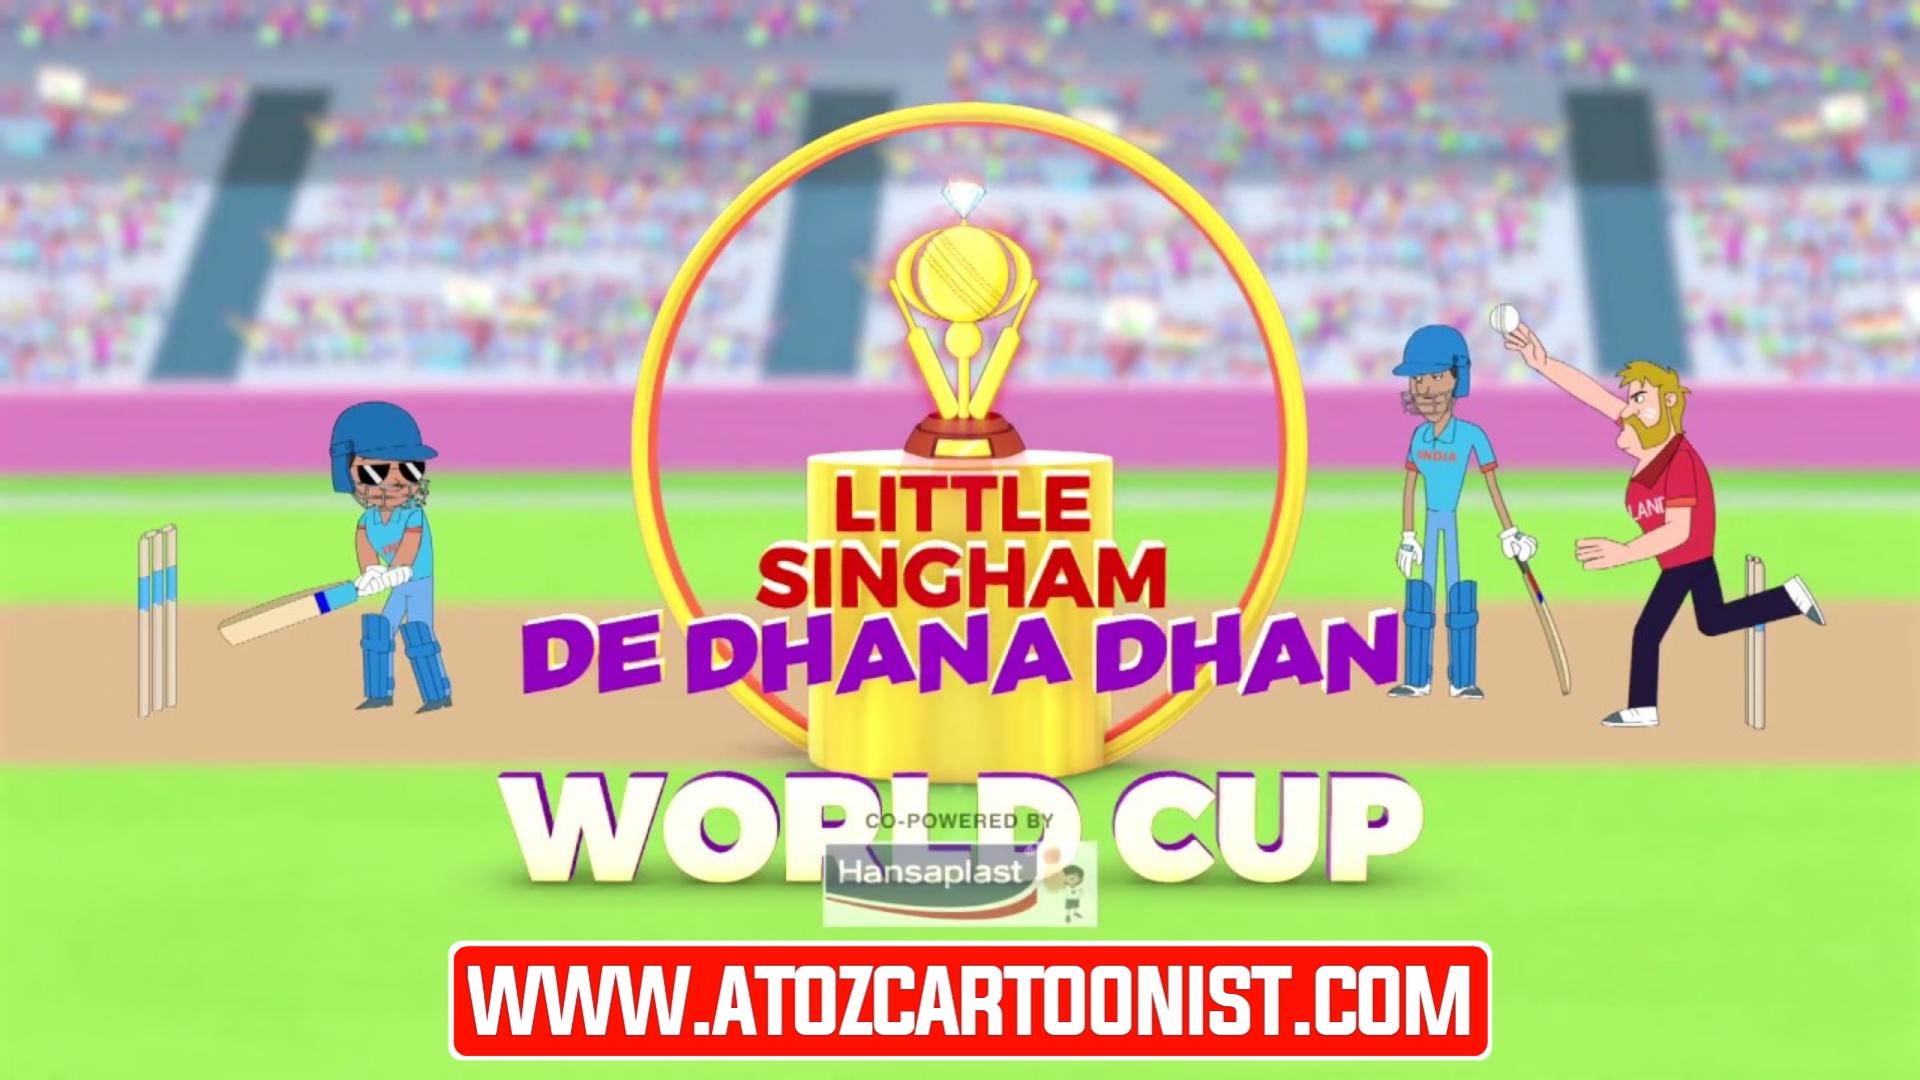 LITTLE SINGHAM : DE DHANA DHAN WORLD CUP FULL MOVIE IN HINDI DOWNLOAD IN [720p HD]